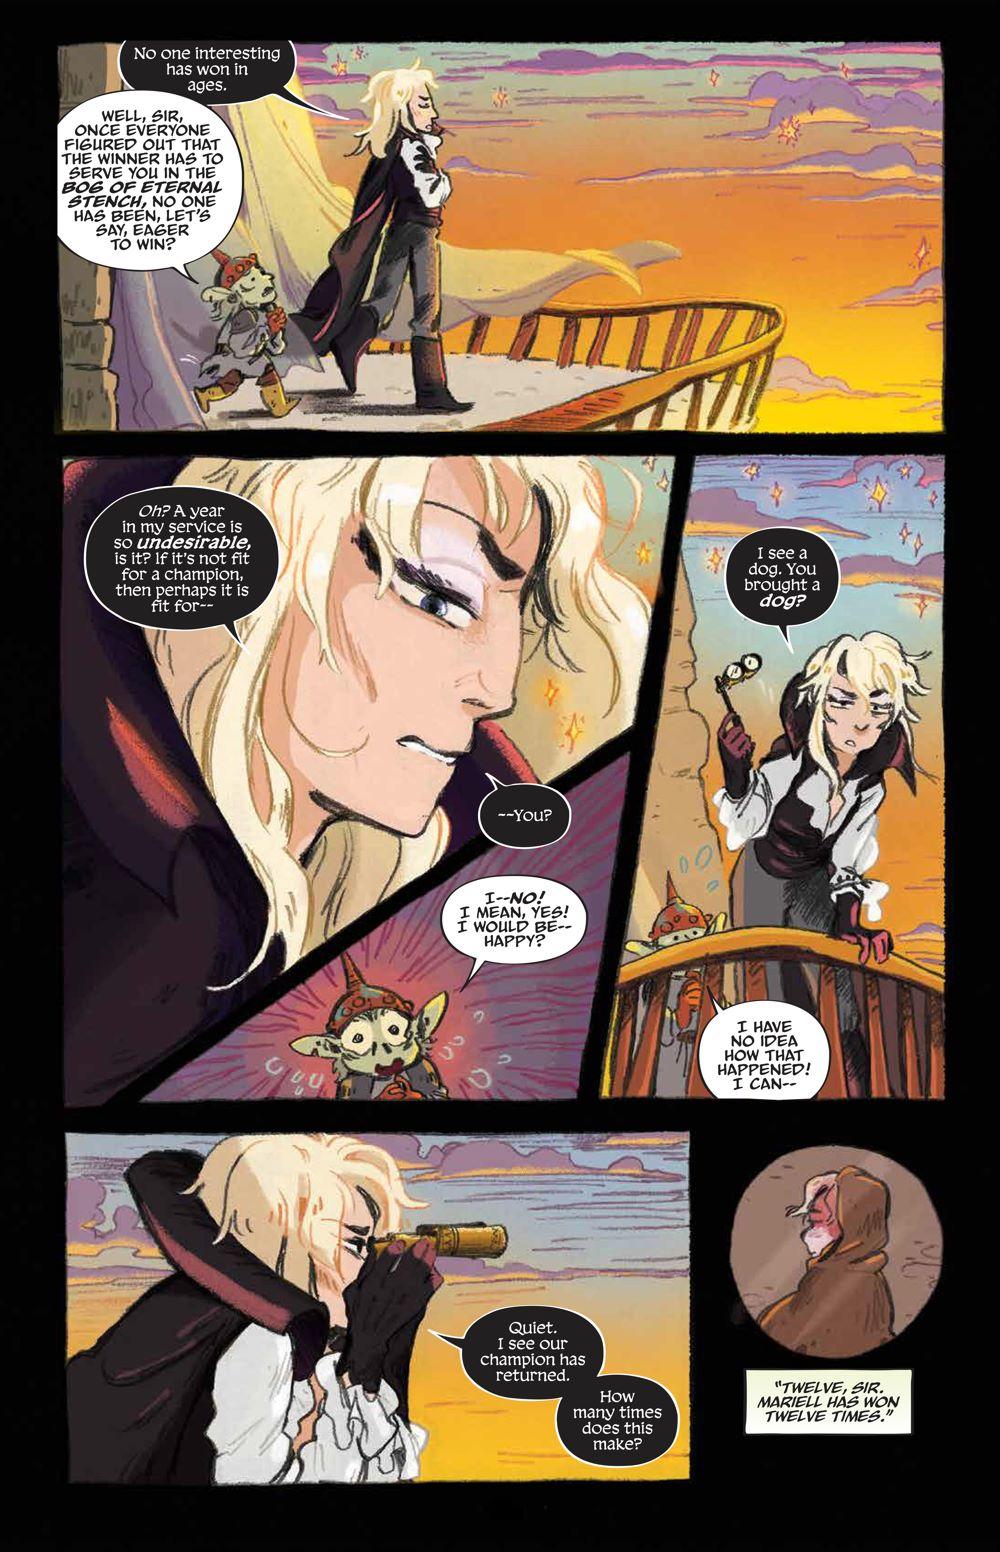 Labyrinth_UnderSpell_HC_PRESS_16 ComicList Previews: JIM HENSON'S LABYRINTH UNDER THE SPELL HC